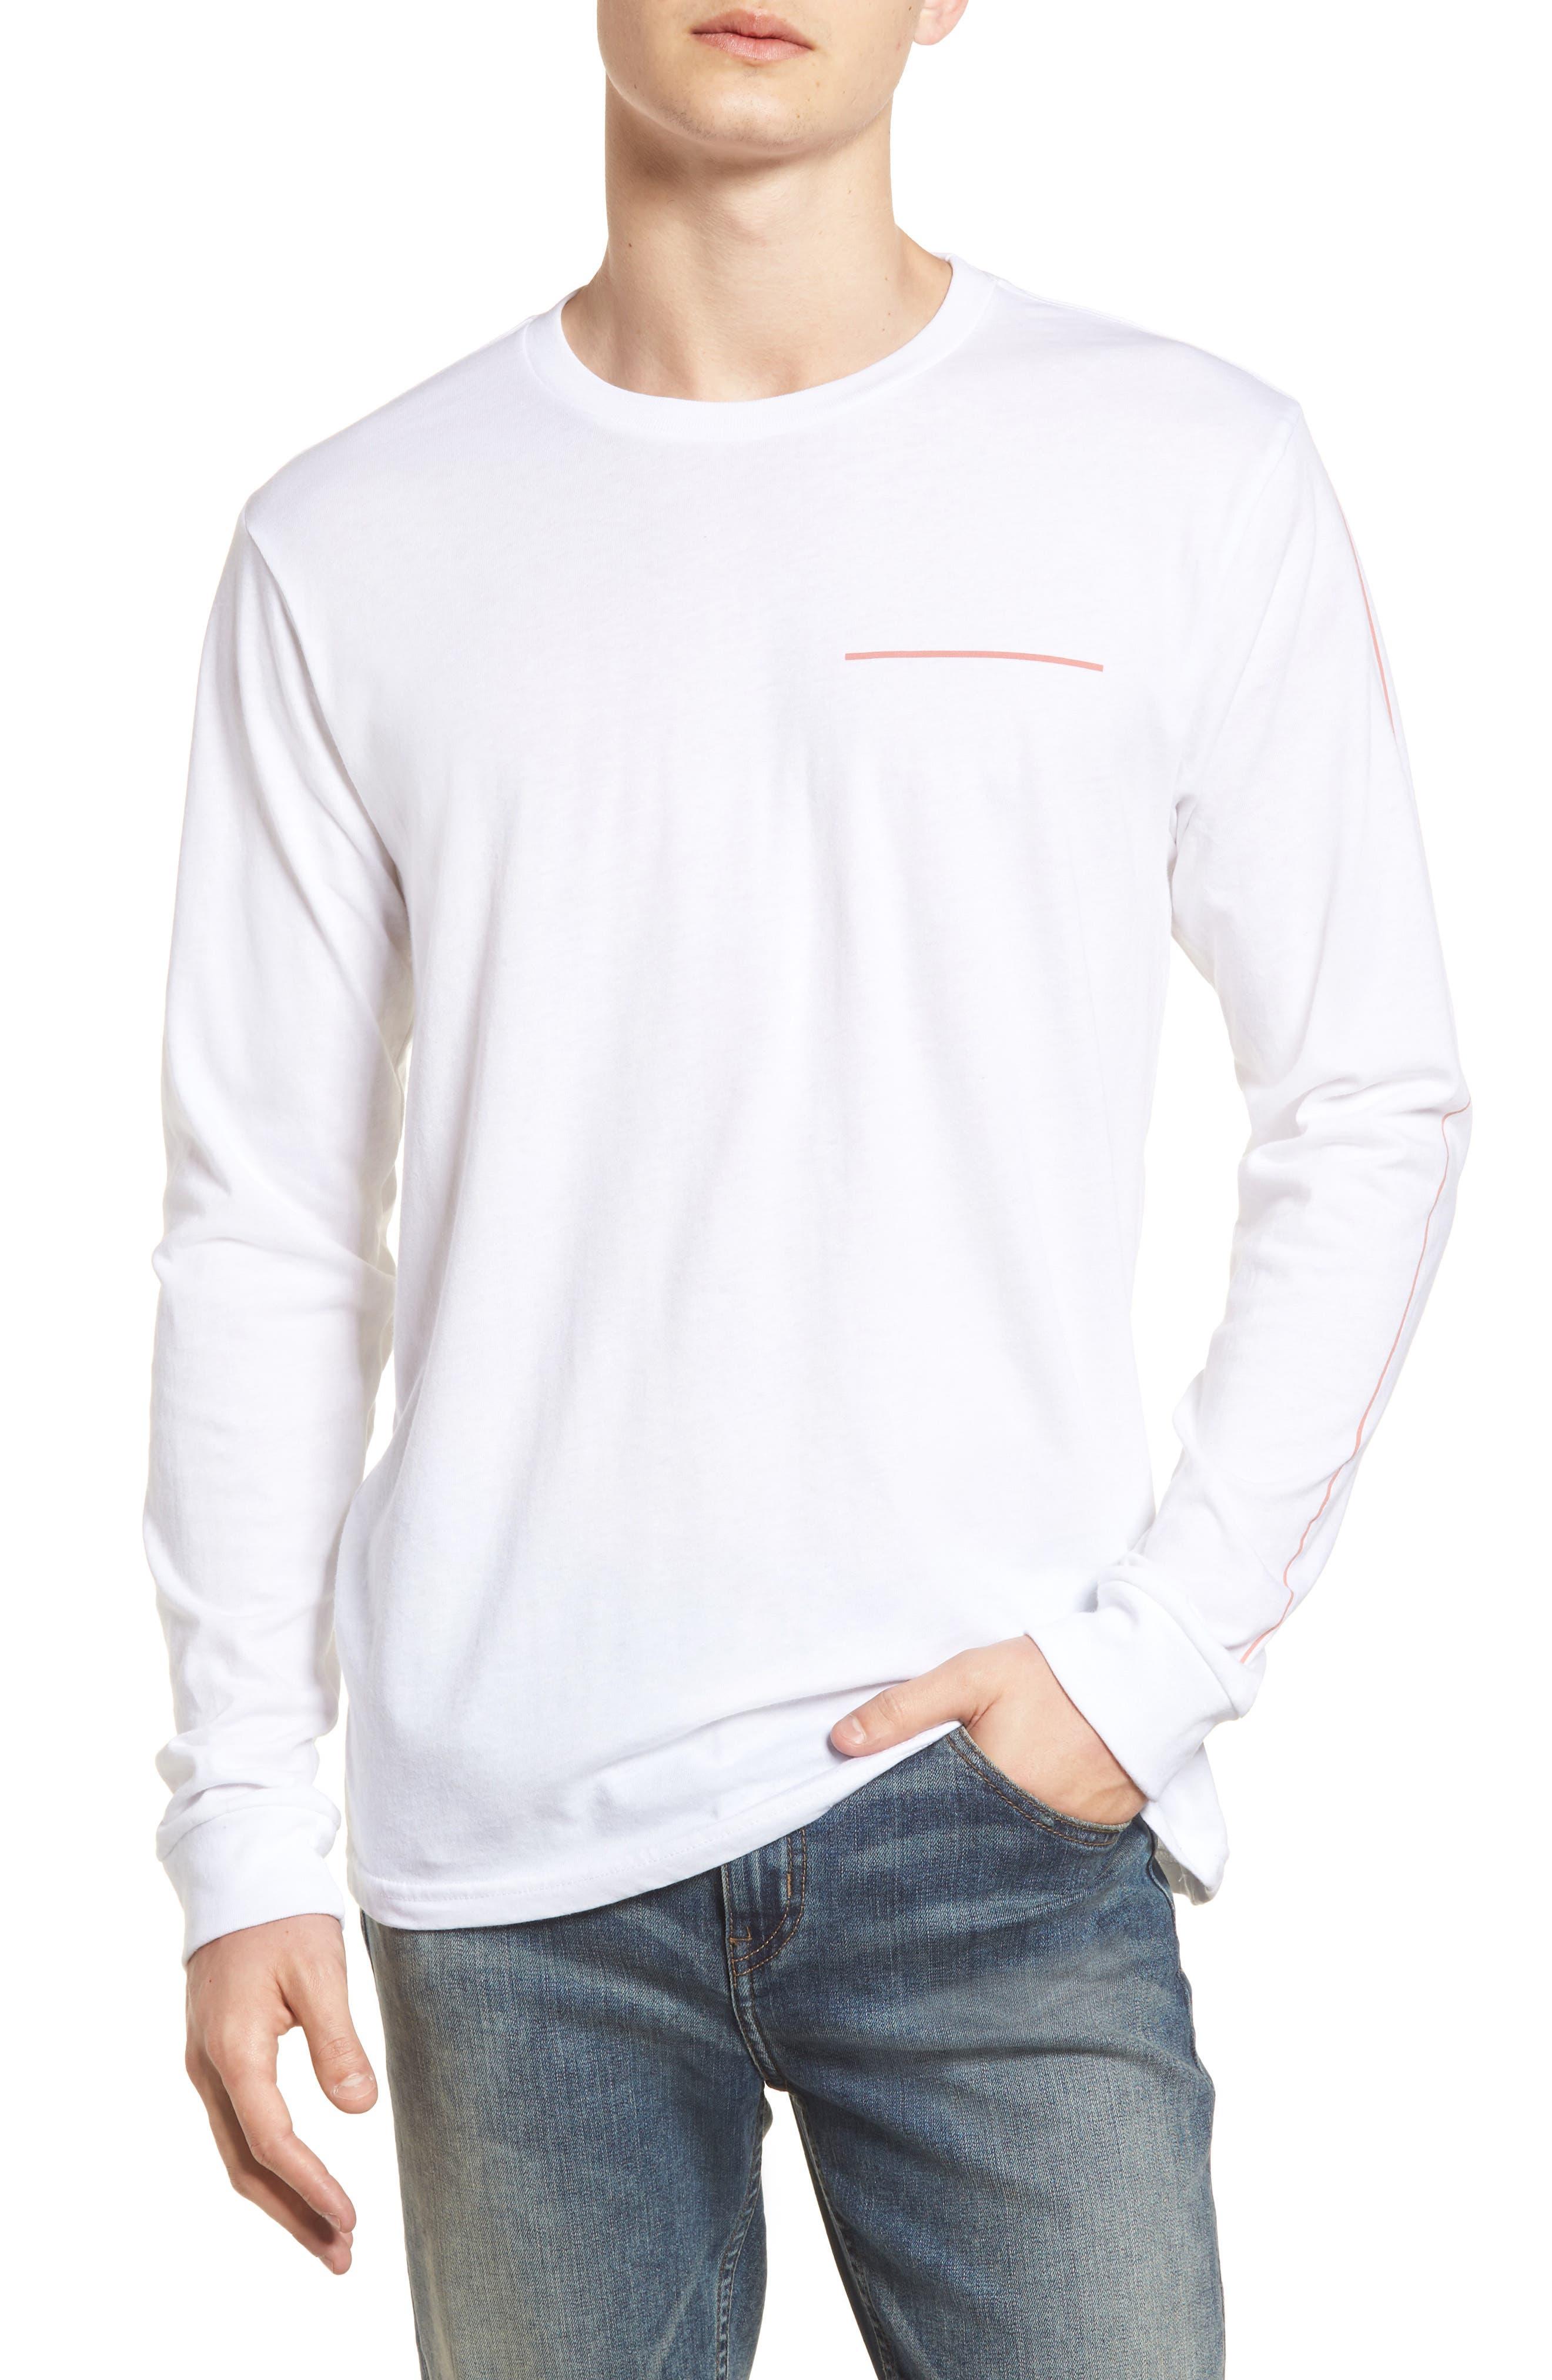 Soto Graphic T-Shirt,                             Main thumbnail 1, color,                             100